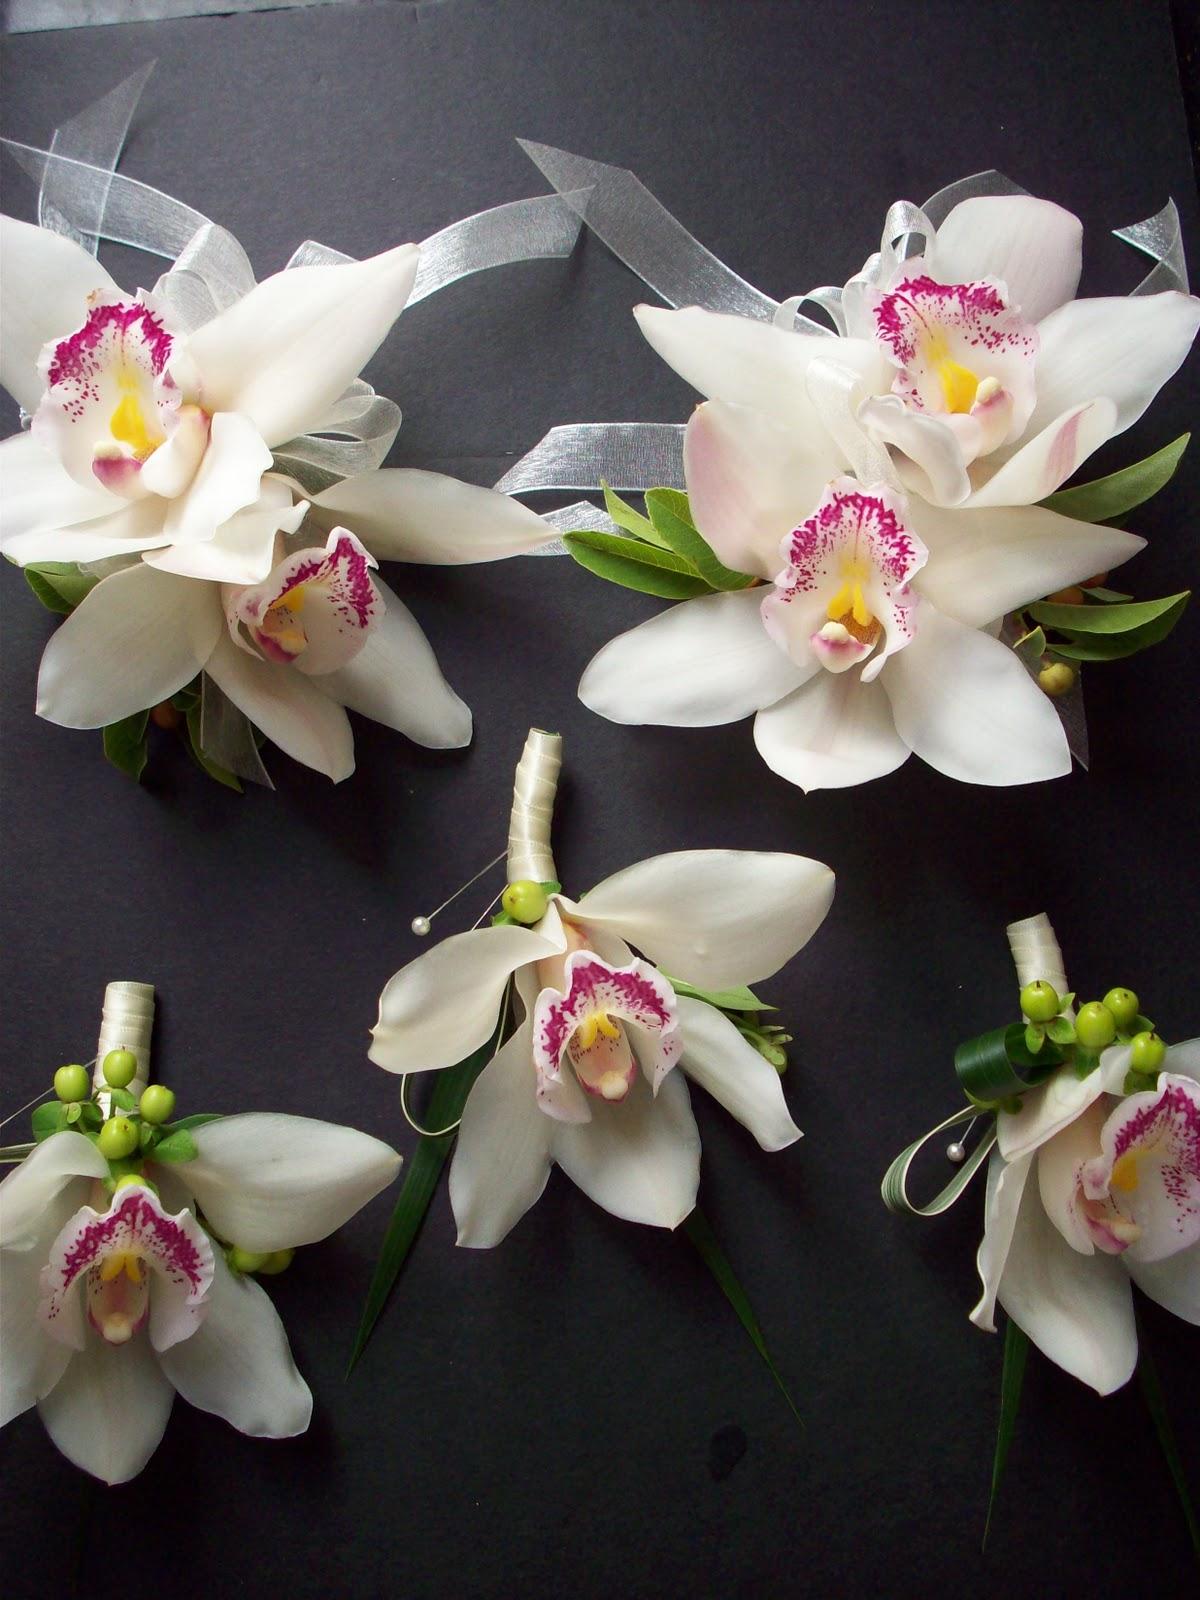 Cymbidium Orchid Wrist Corsages: Gousicteco: Orchid Cymbidium Corsage Images